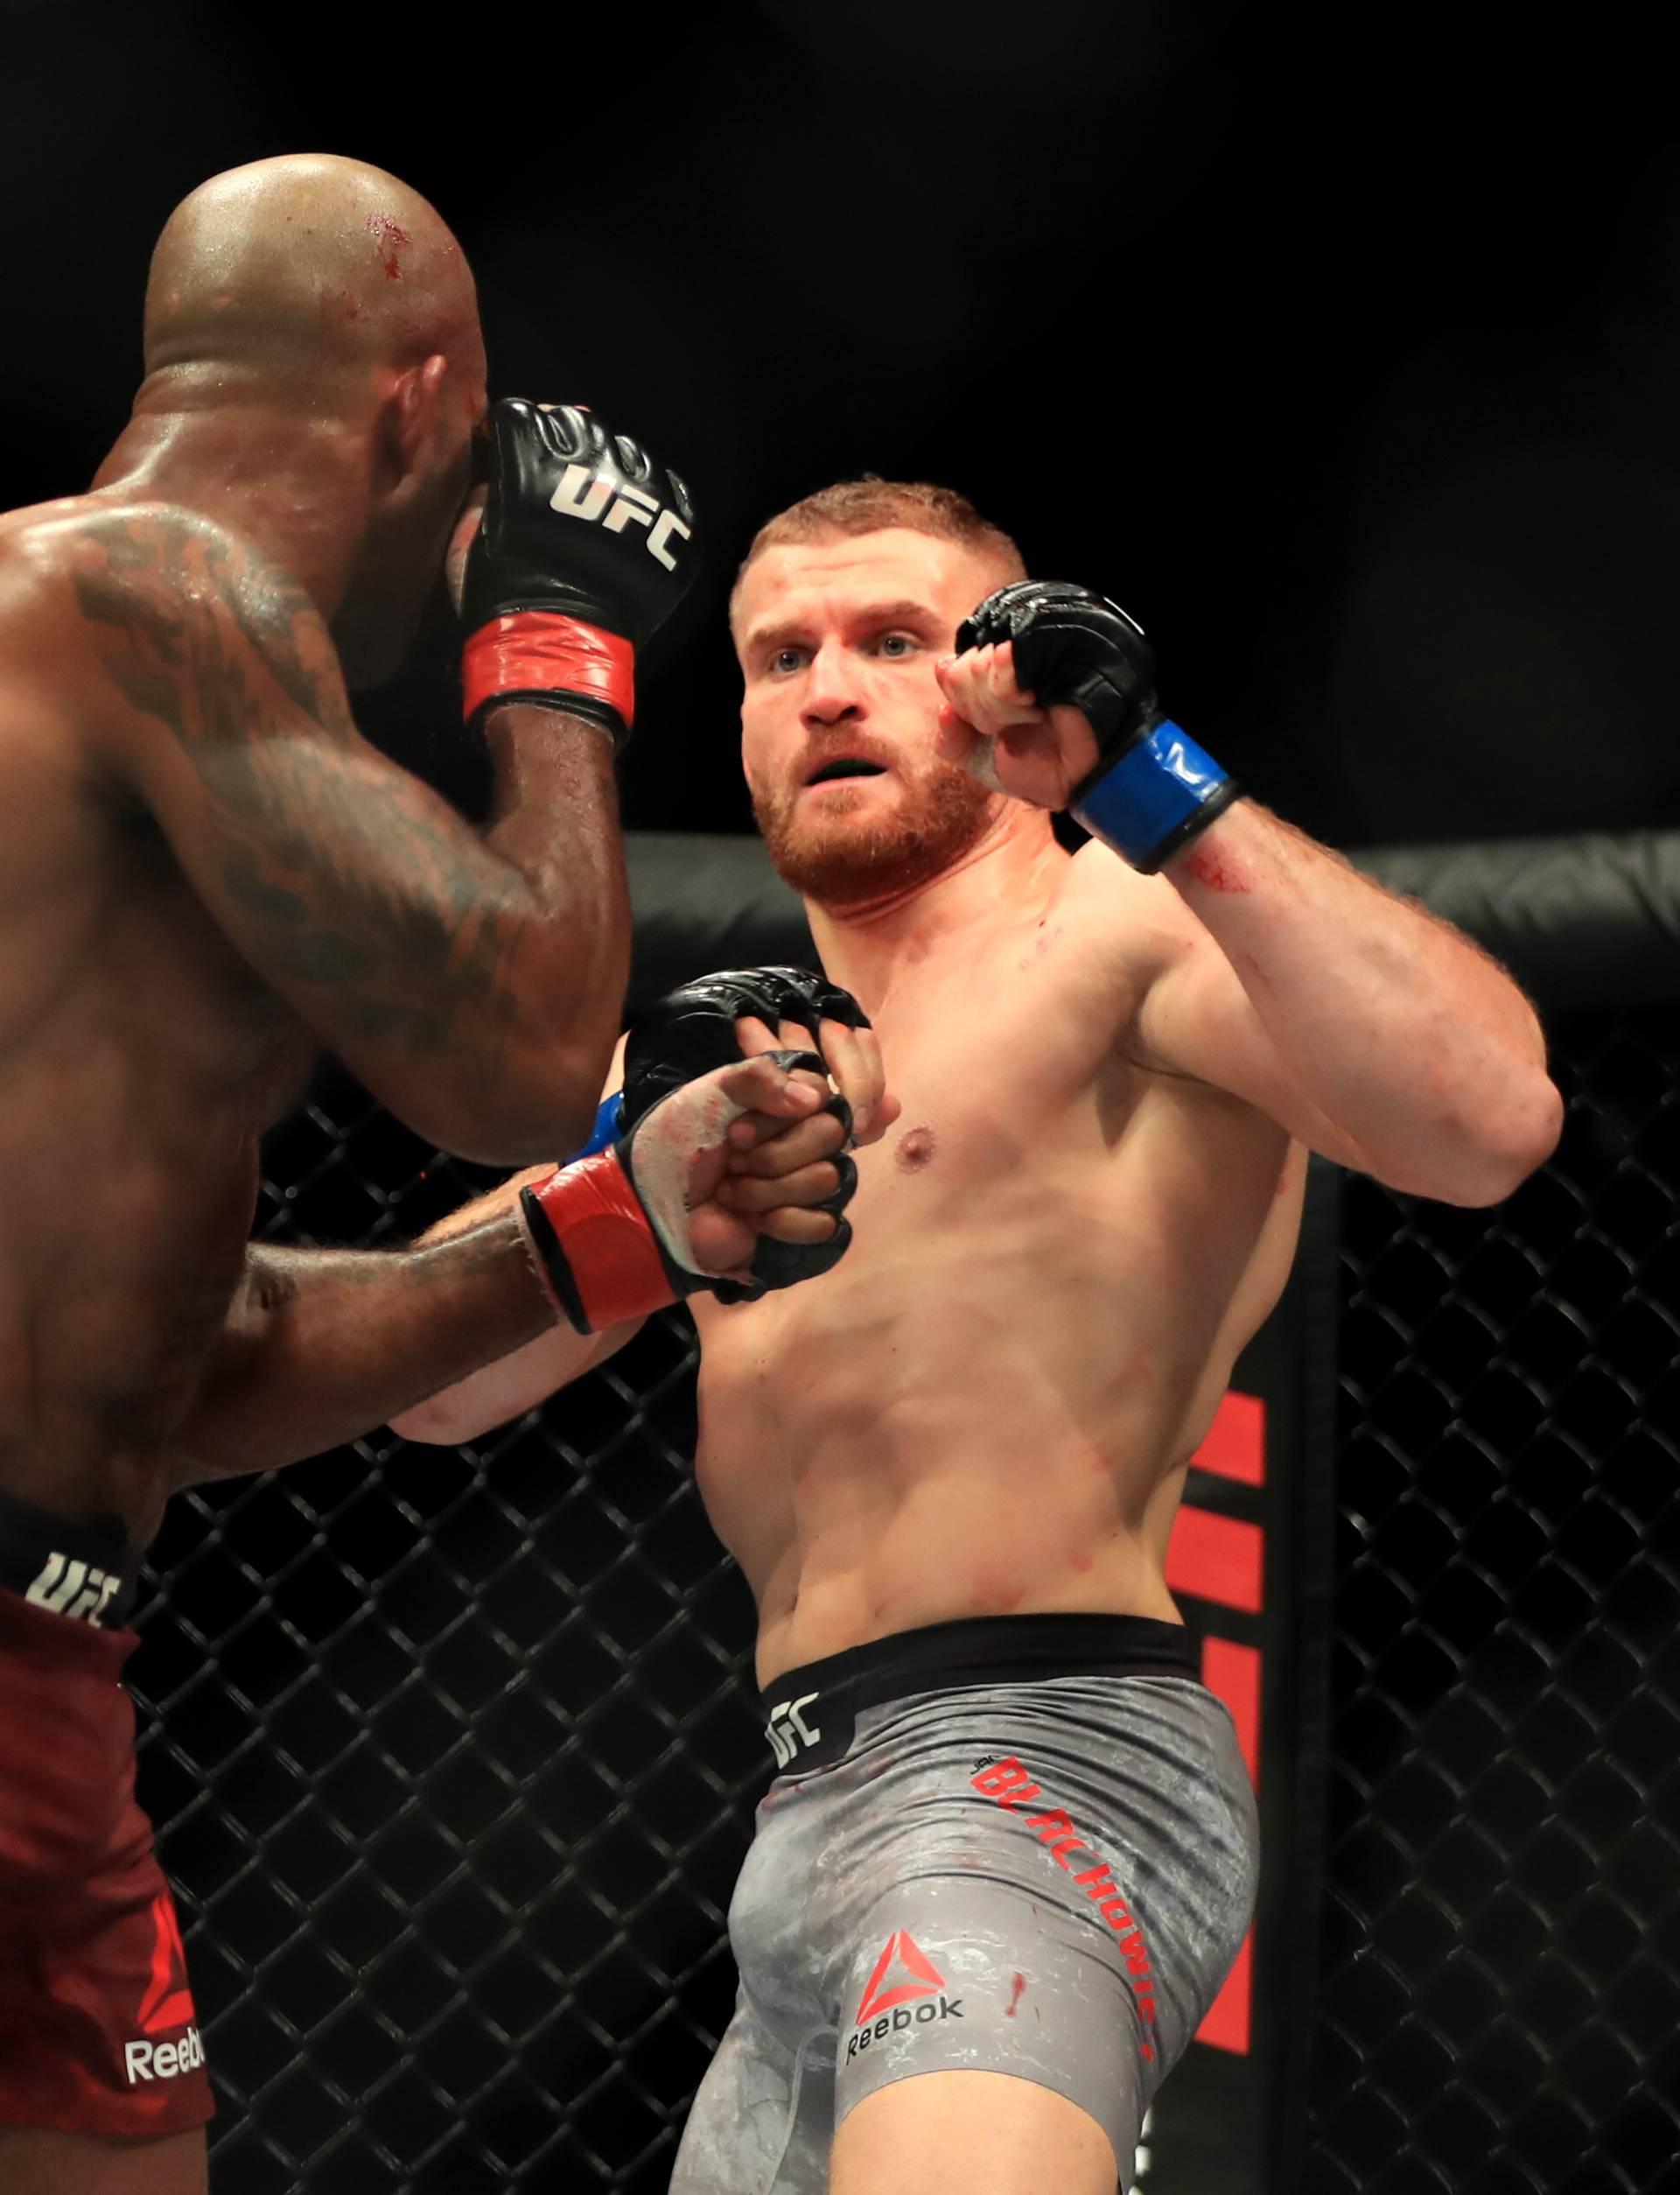 UFC Fight Night - The O2 Arena